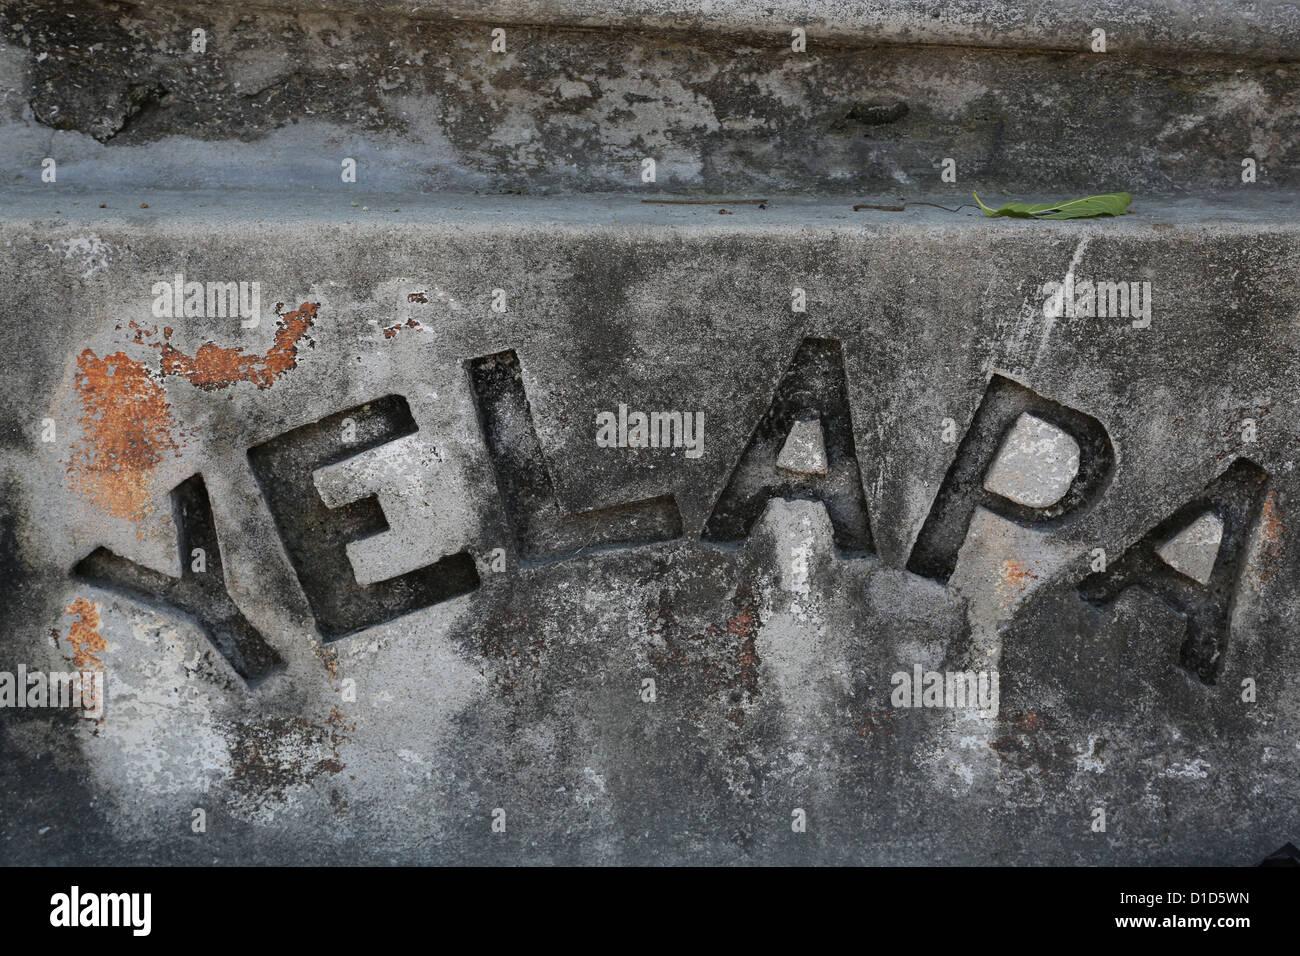 Ein Schild am Eingang zum Dorf Yelapa, Jalisco, Mexiko. Stockbild